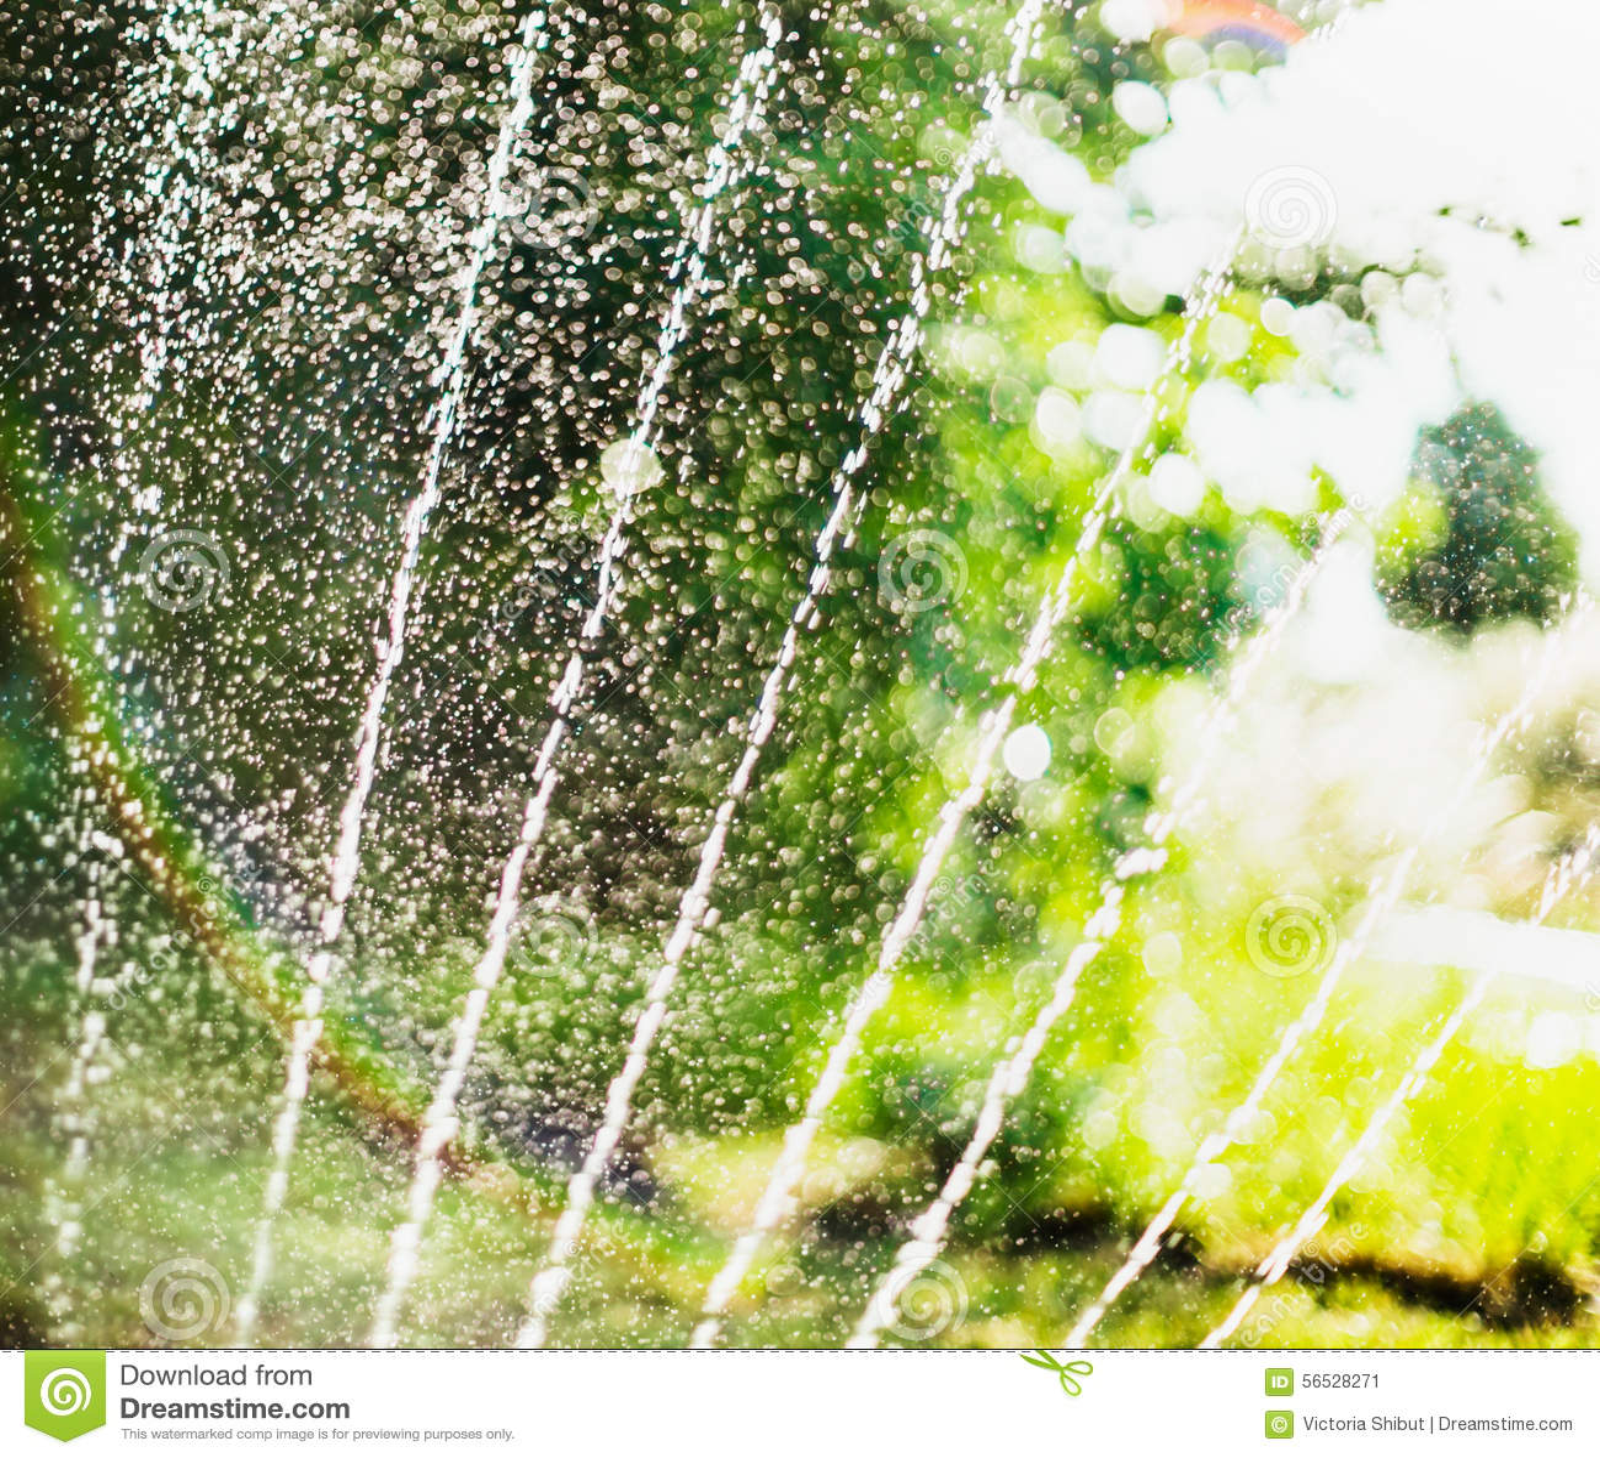 Backyard Summer Background :  Summer Garden With Sprinkler On Blurred Tree Foliage Background Stock